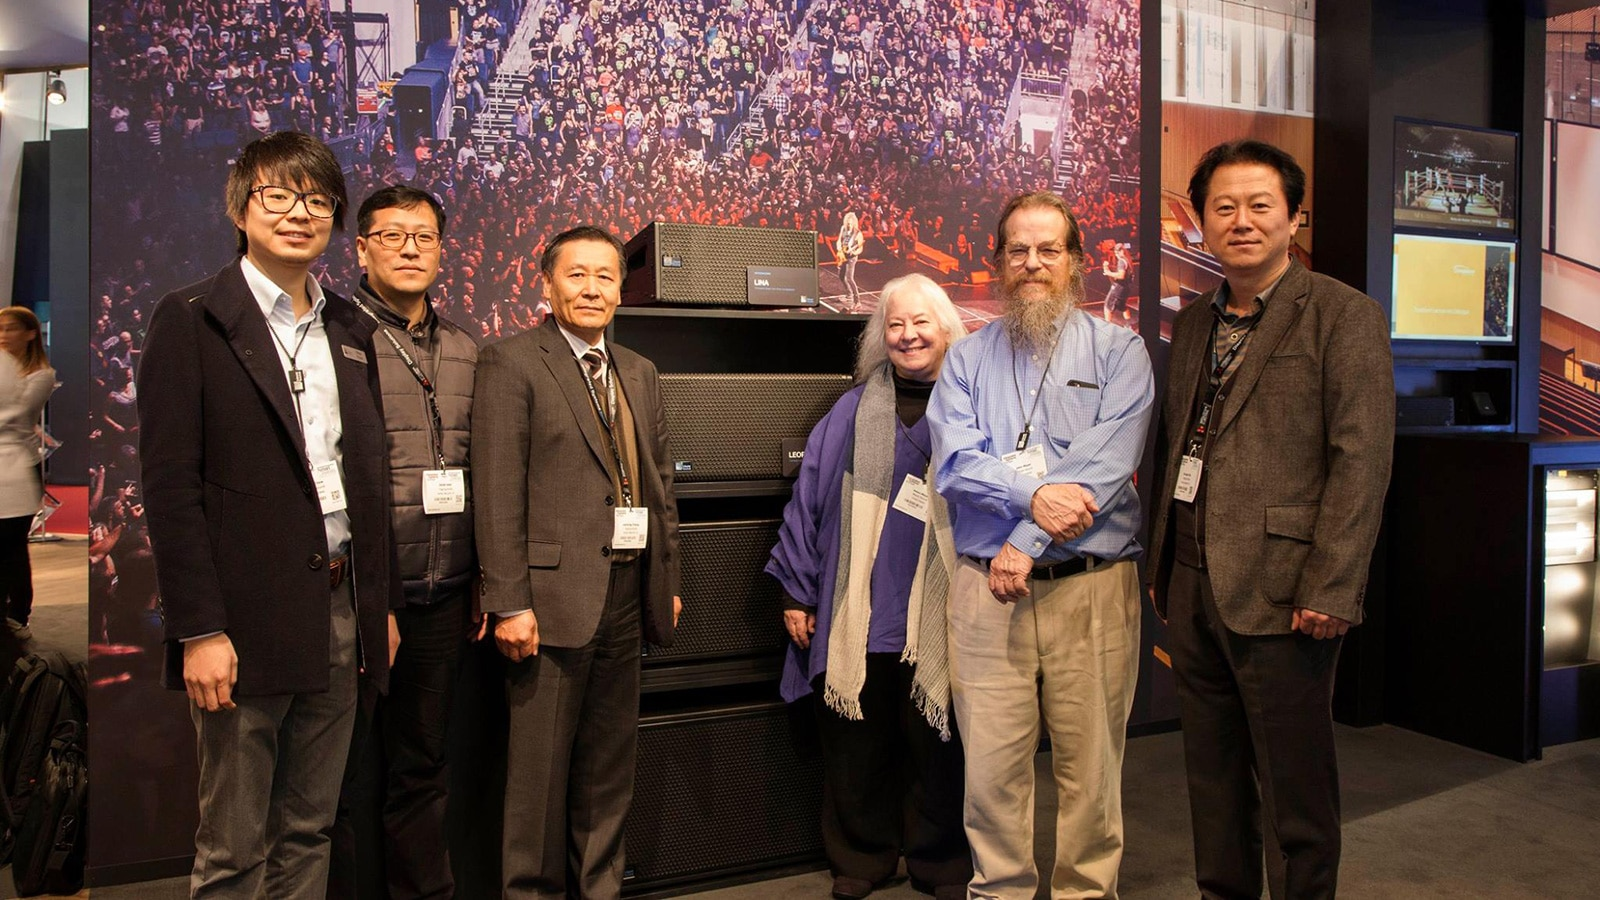 Left to Right: Brian Chow, Eric Han, Joo Hong Chang, Helen Meyer, John Meyer, Steve Kim